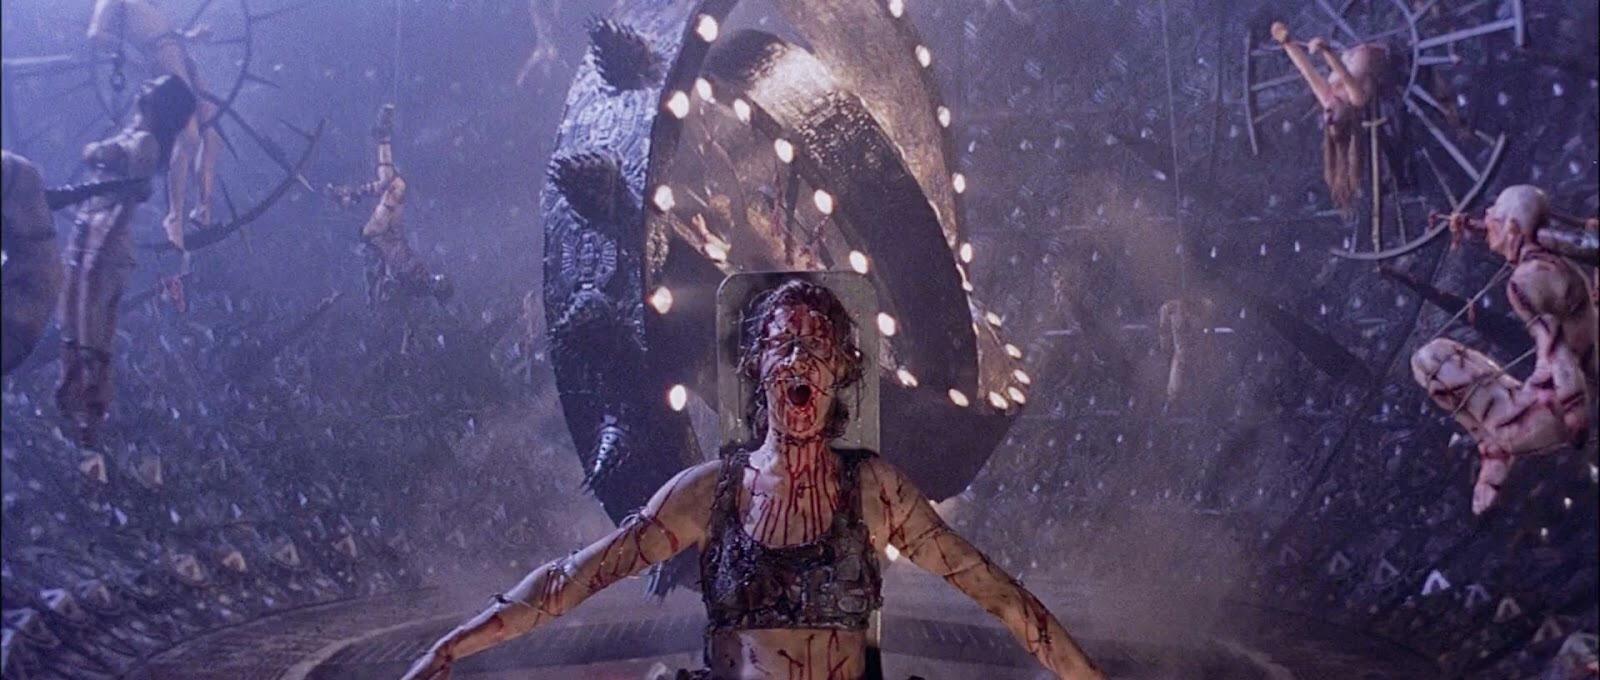 event horizon top 10 sci-fi horror movies